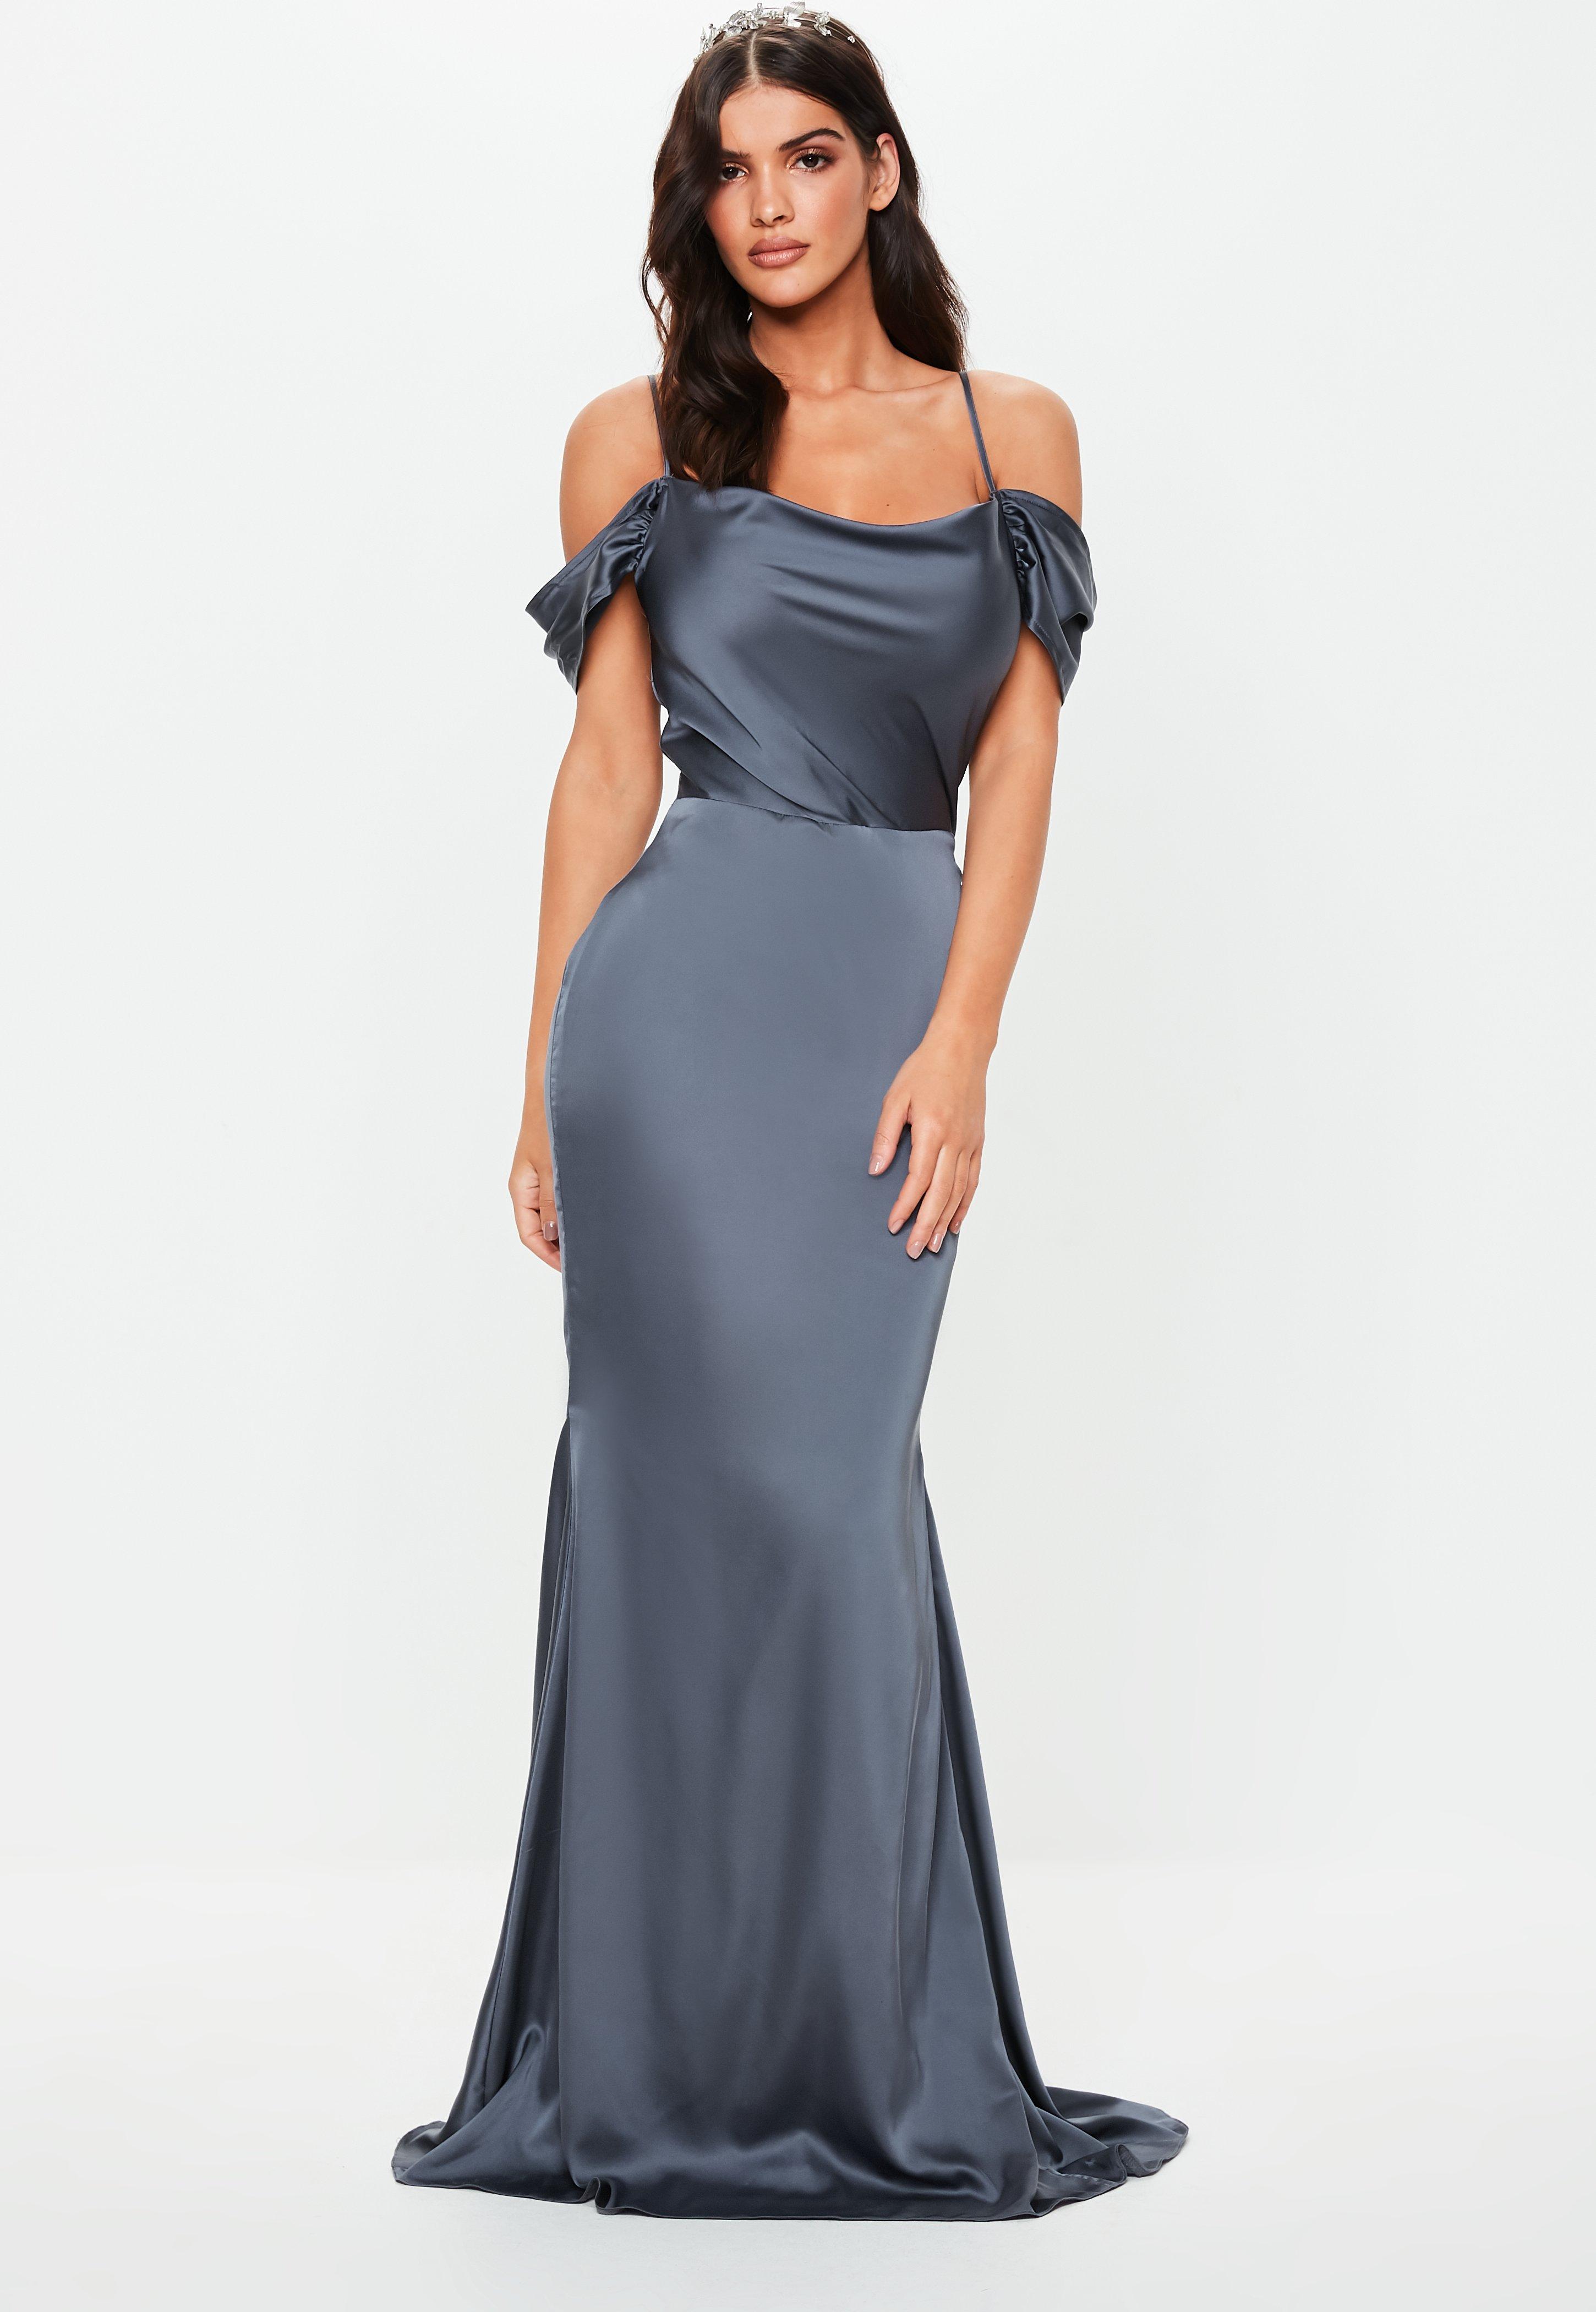 e5a38bff1c Bridesmaid Grey Satin Cowl Cold Shoulder Maxi Dress | Missguided